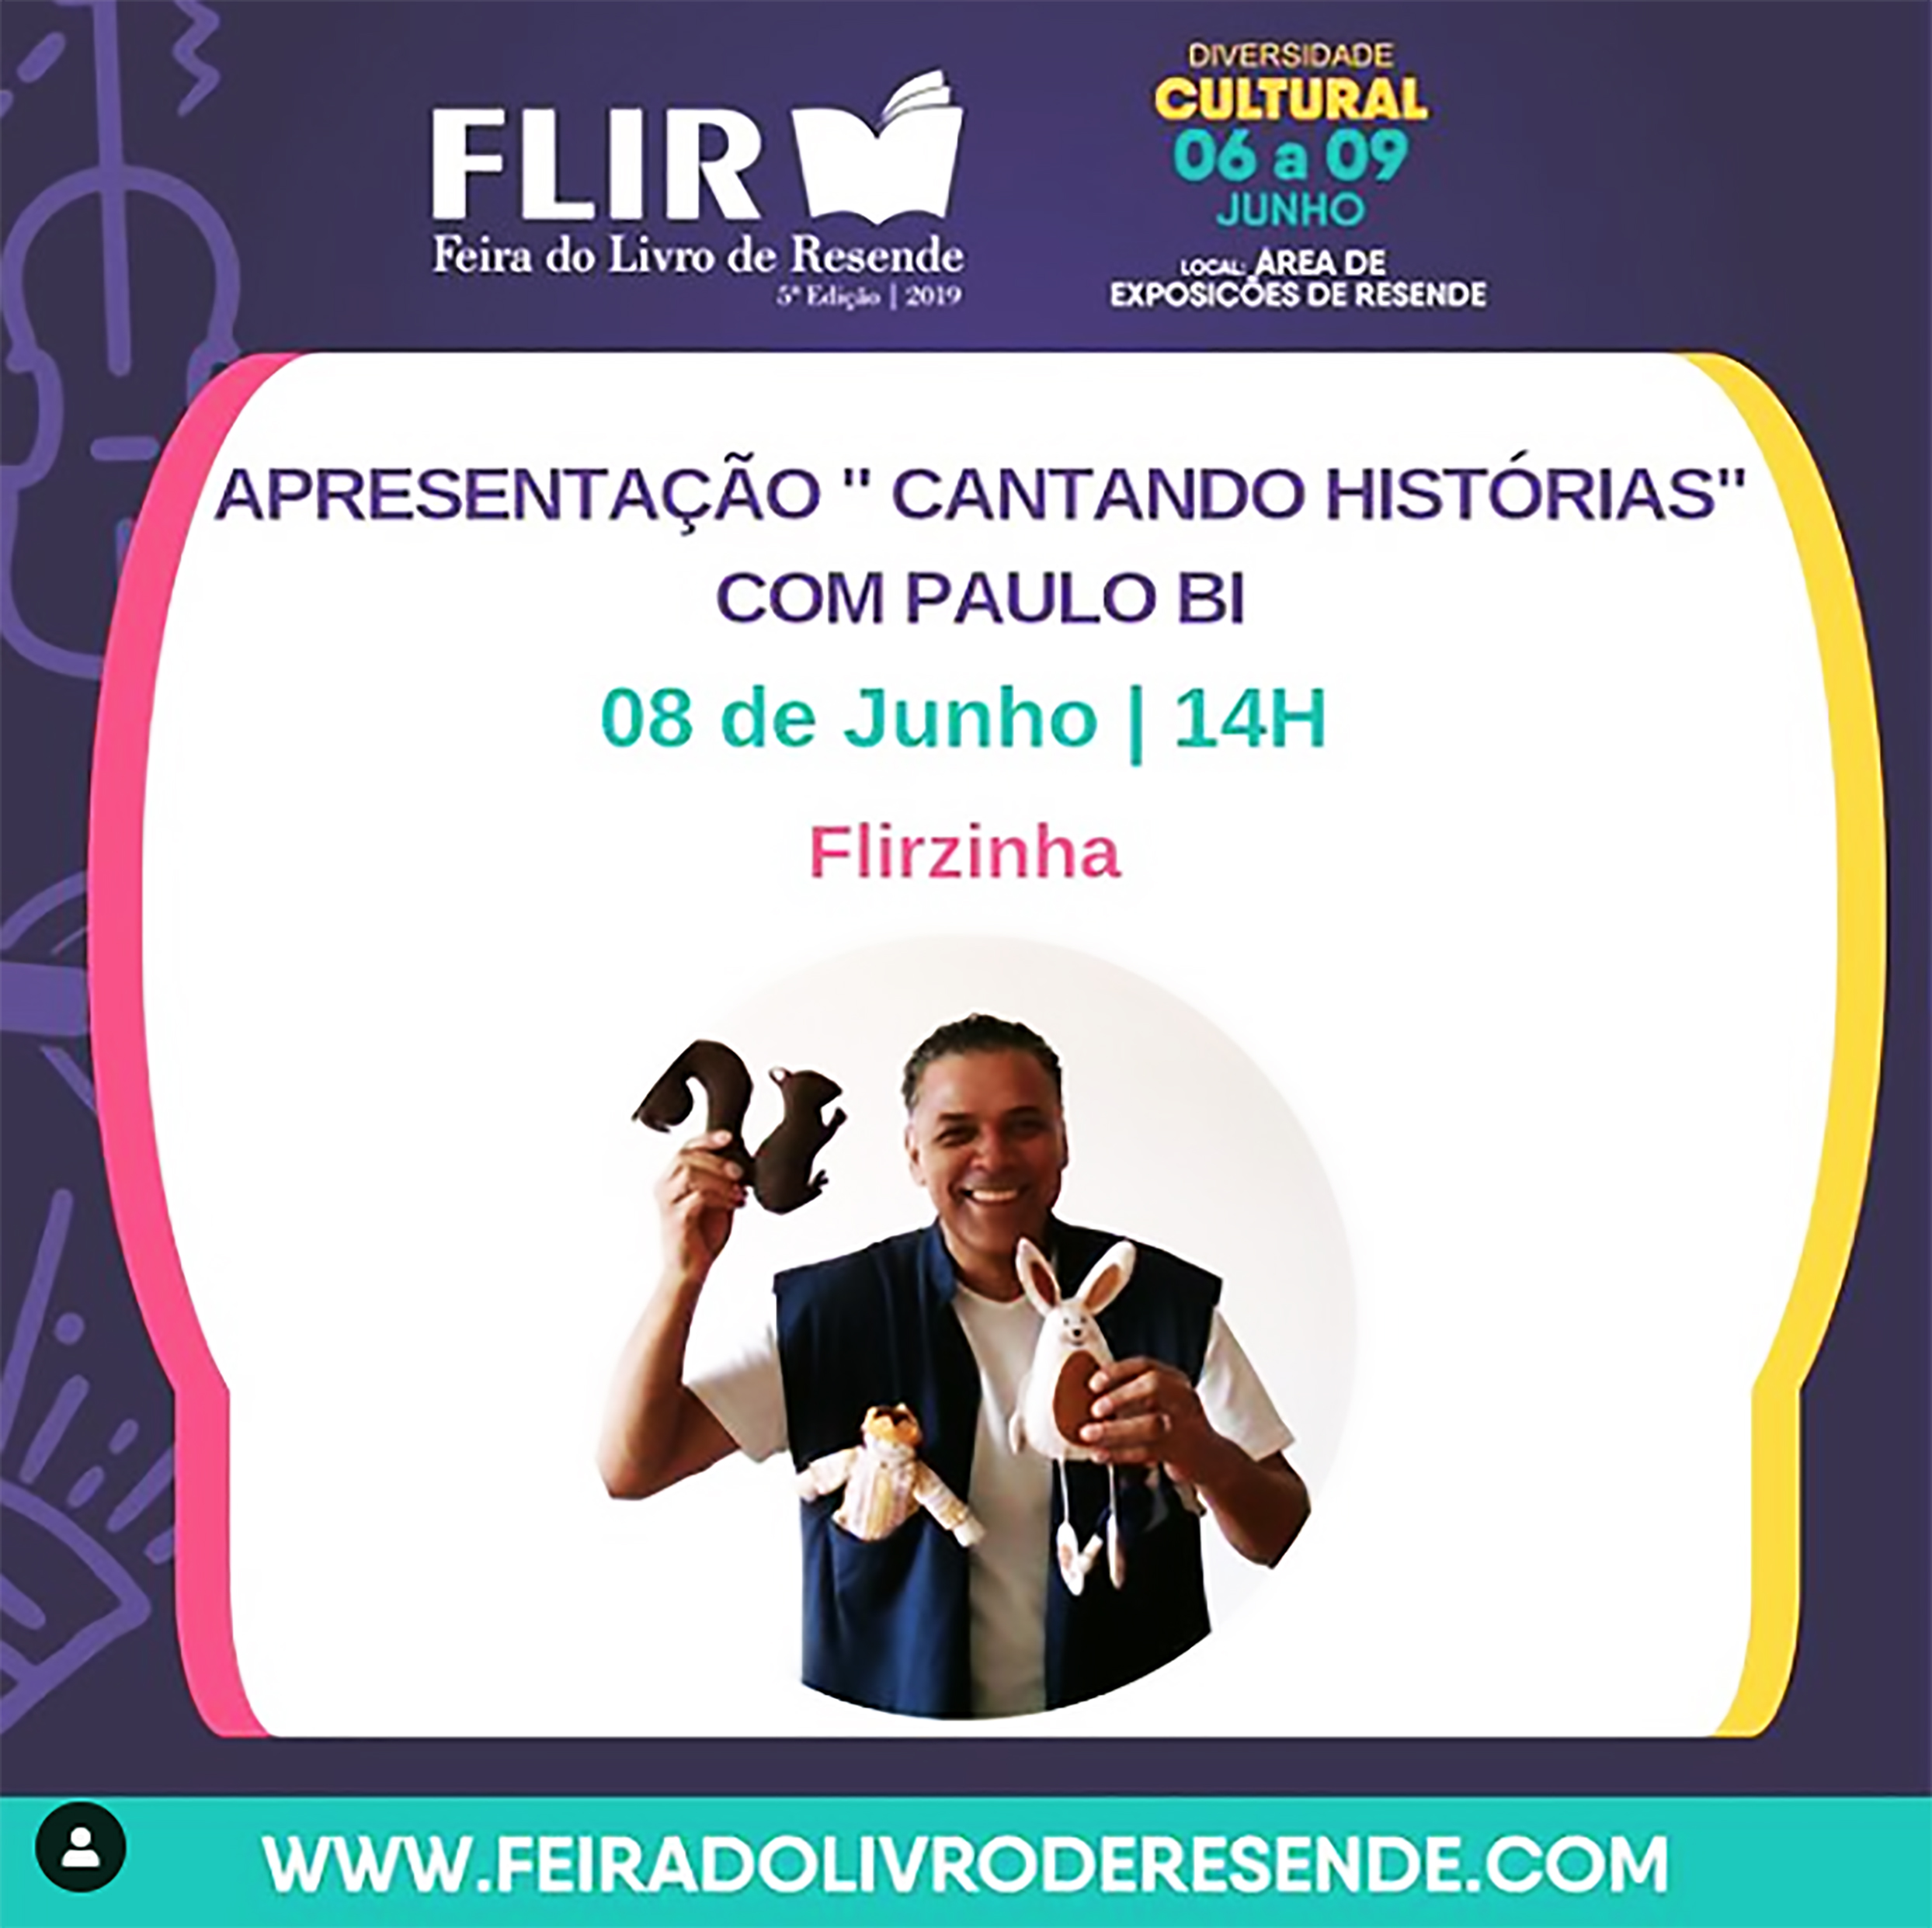 FLIR 2019